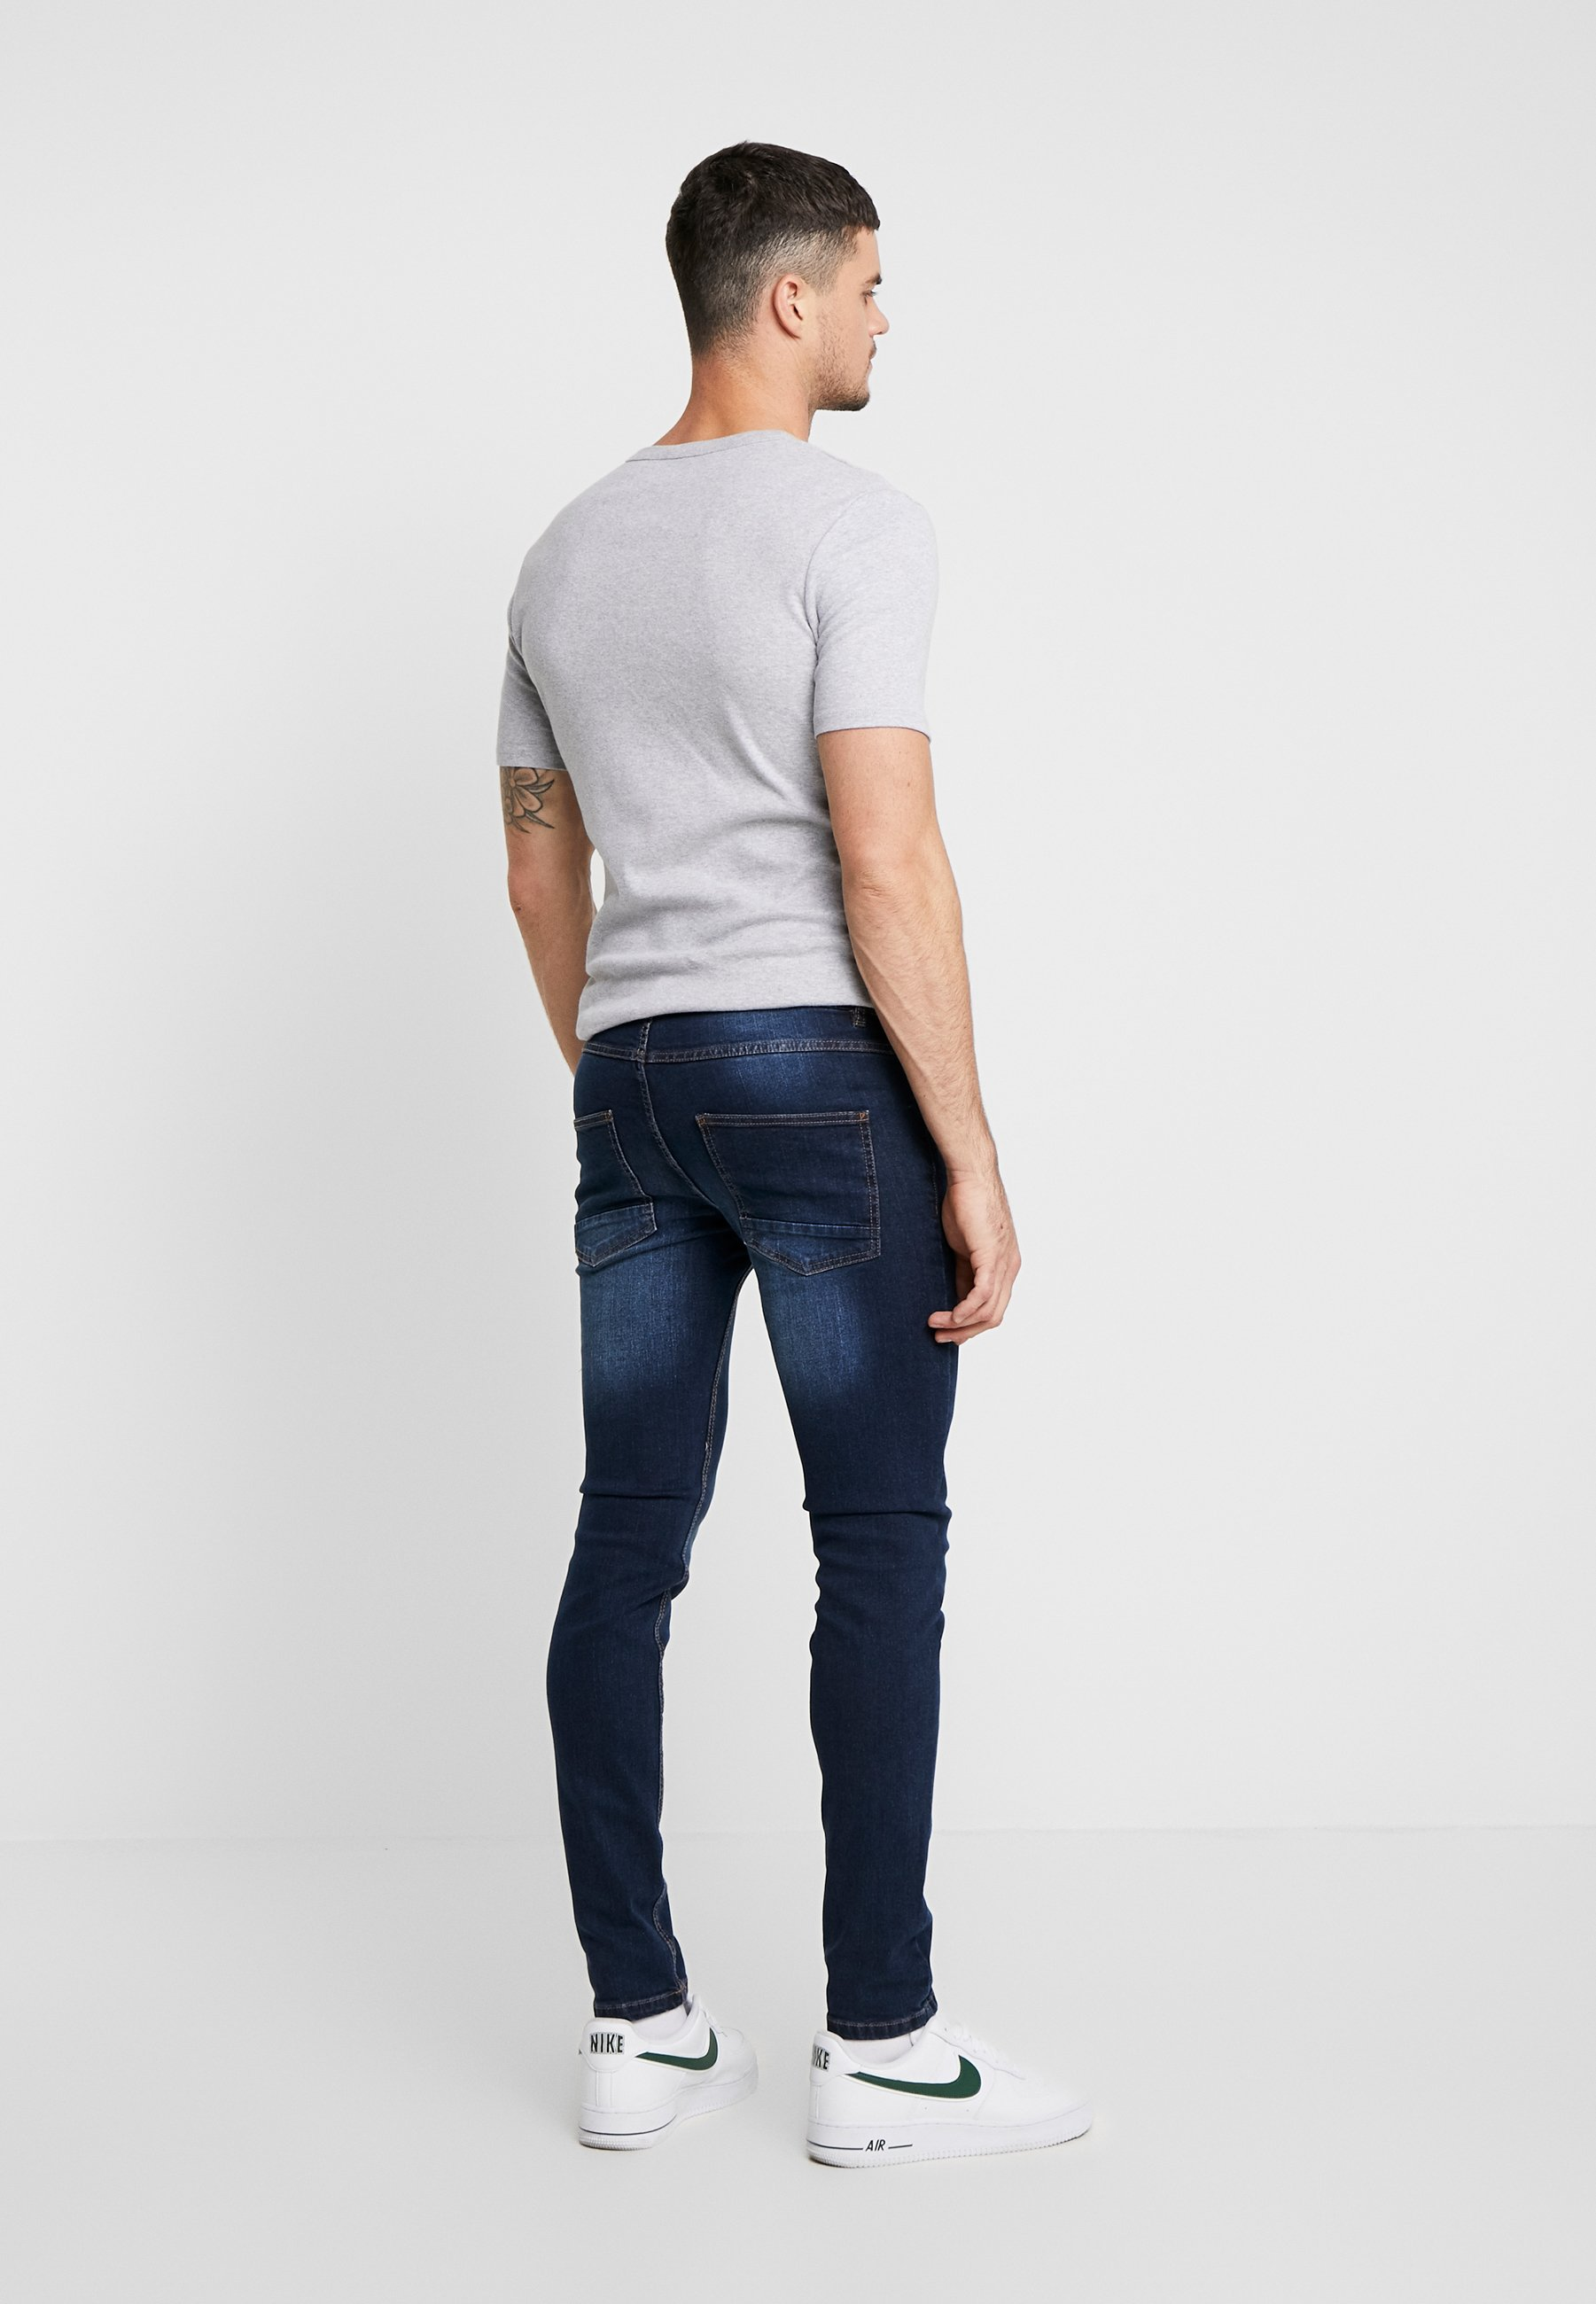 Rebel Fit Dark Sea Skinny Redefined CopenhagenJeans vbfgyY76